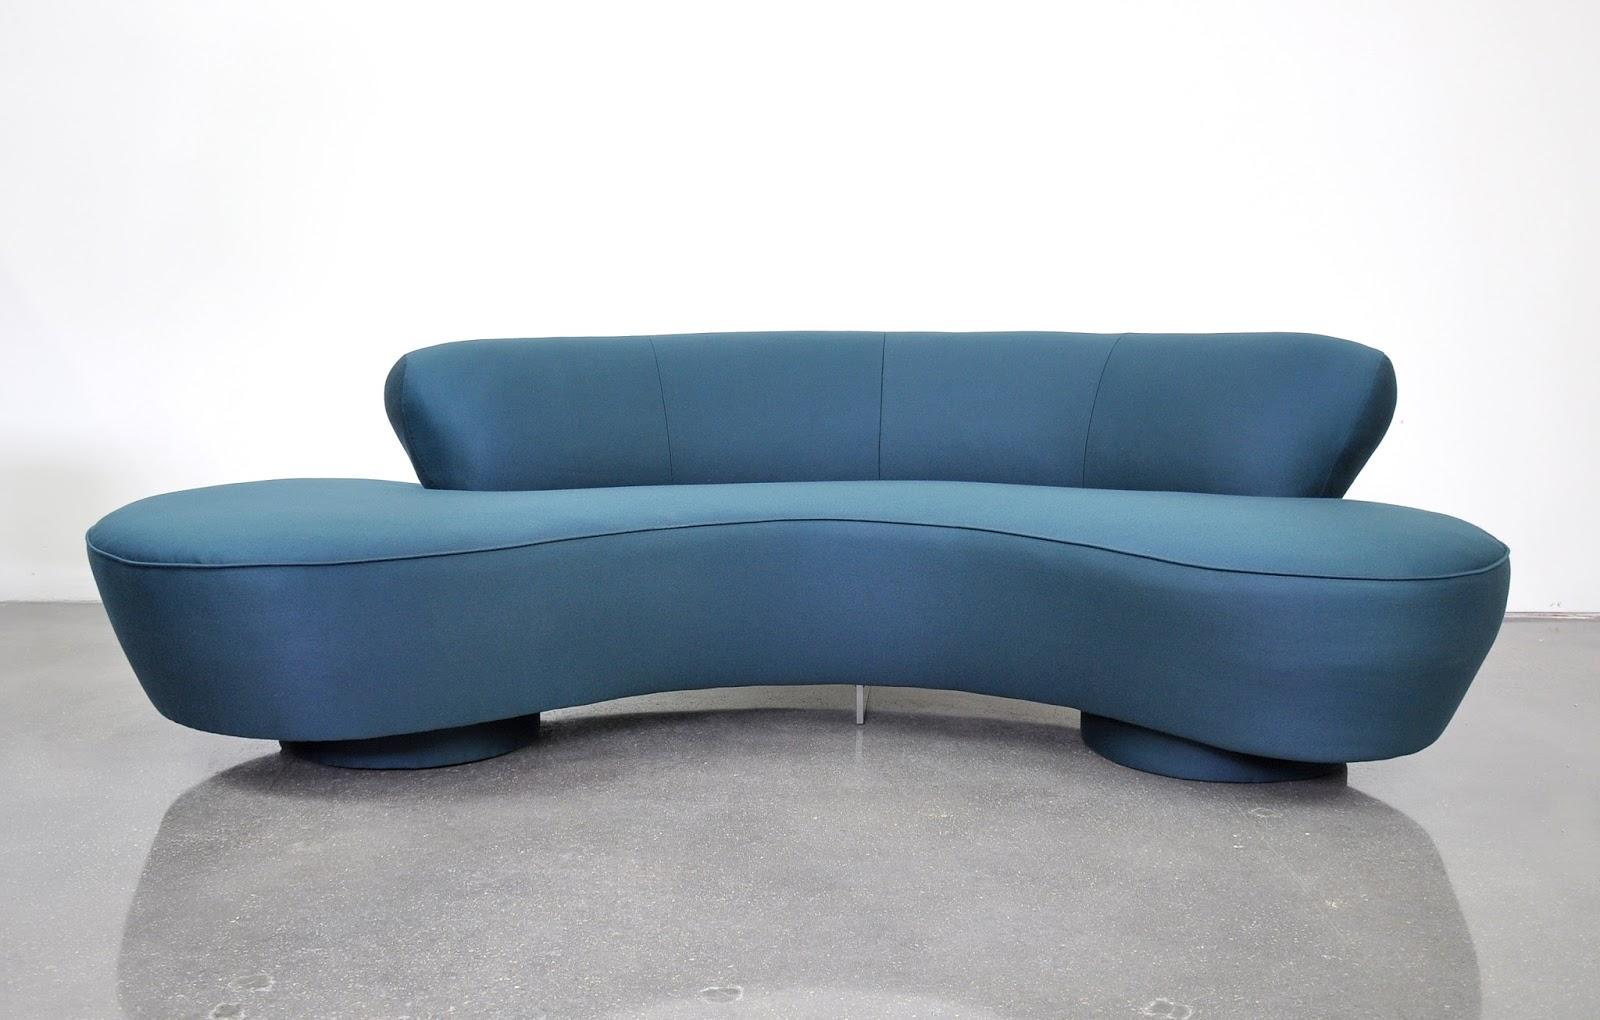 Select Modern Vladimir Kagan Directional Serpentine Sofa